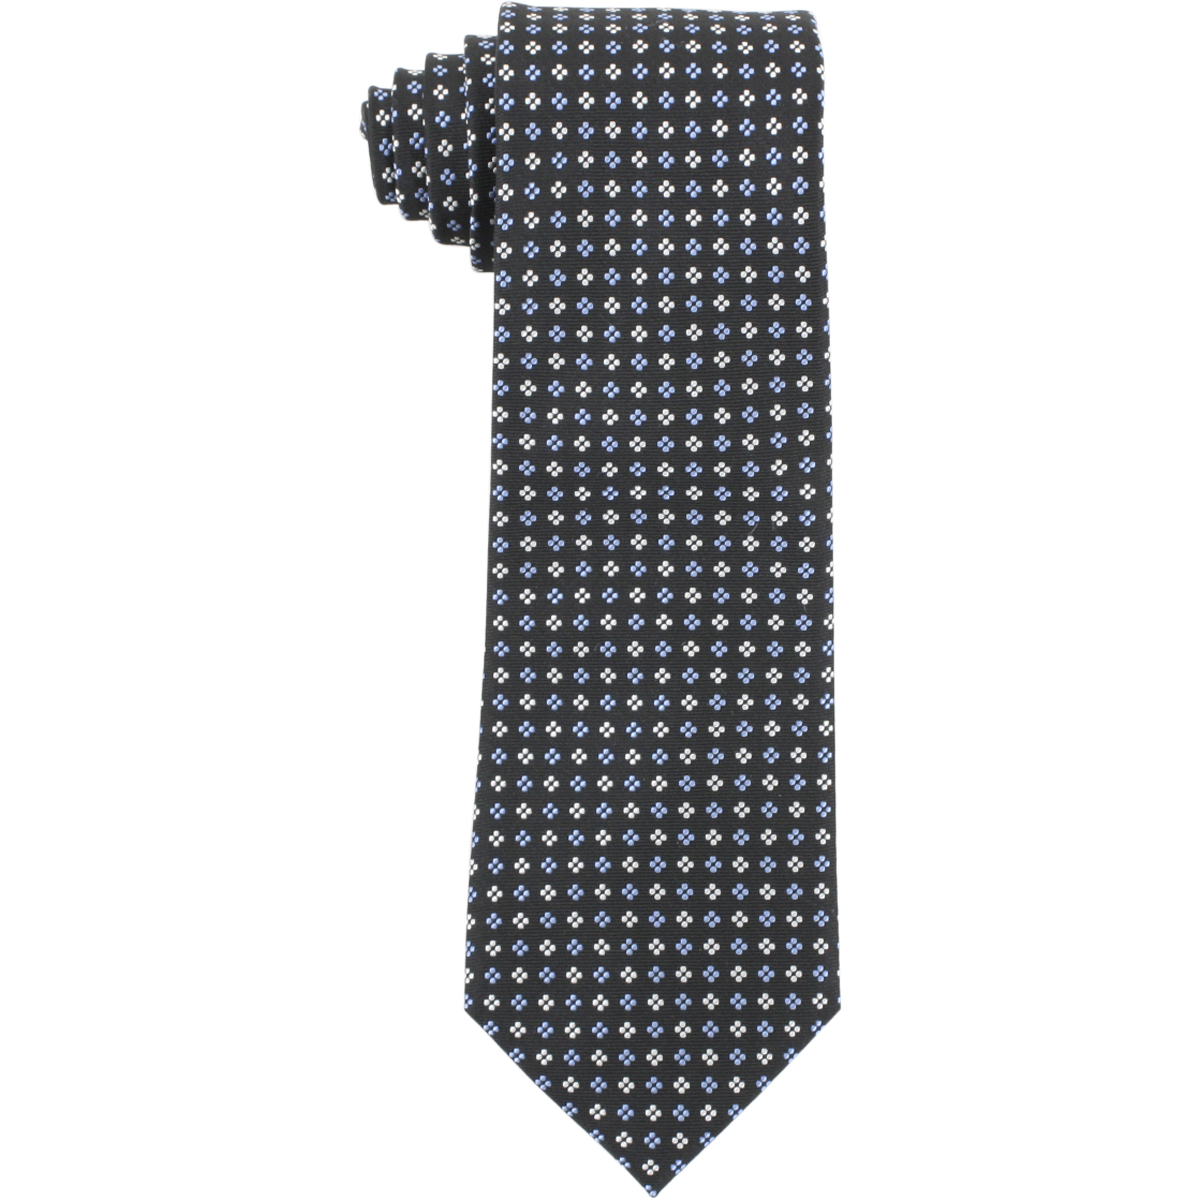 Image of Tommy Hilfiger Men's Silk Core Neat II Print Tie - Black - 3.25 Inch